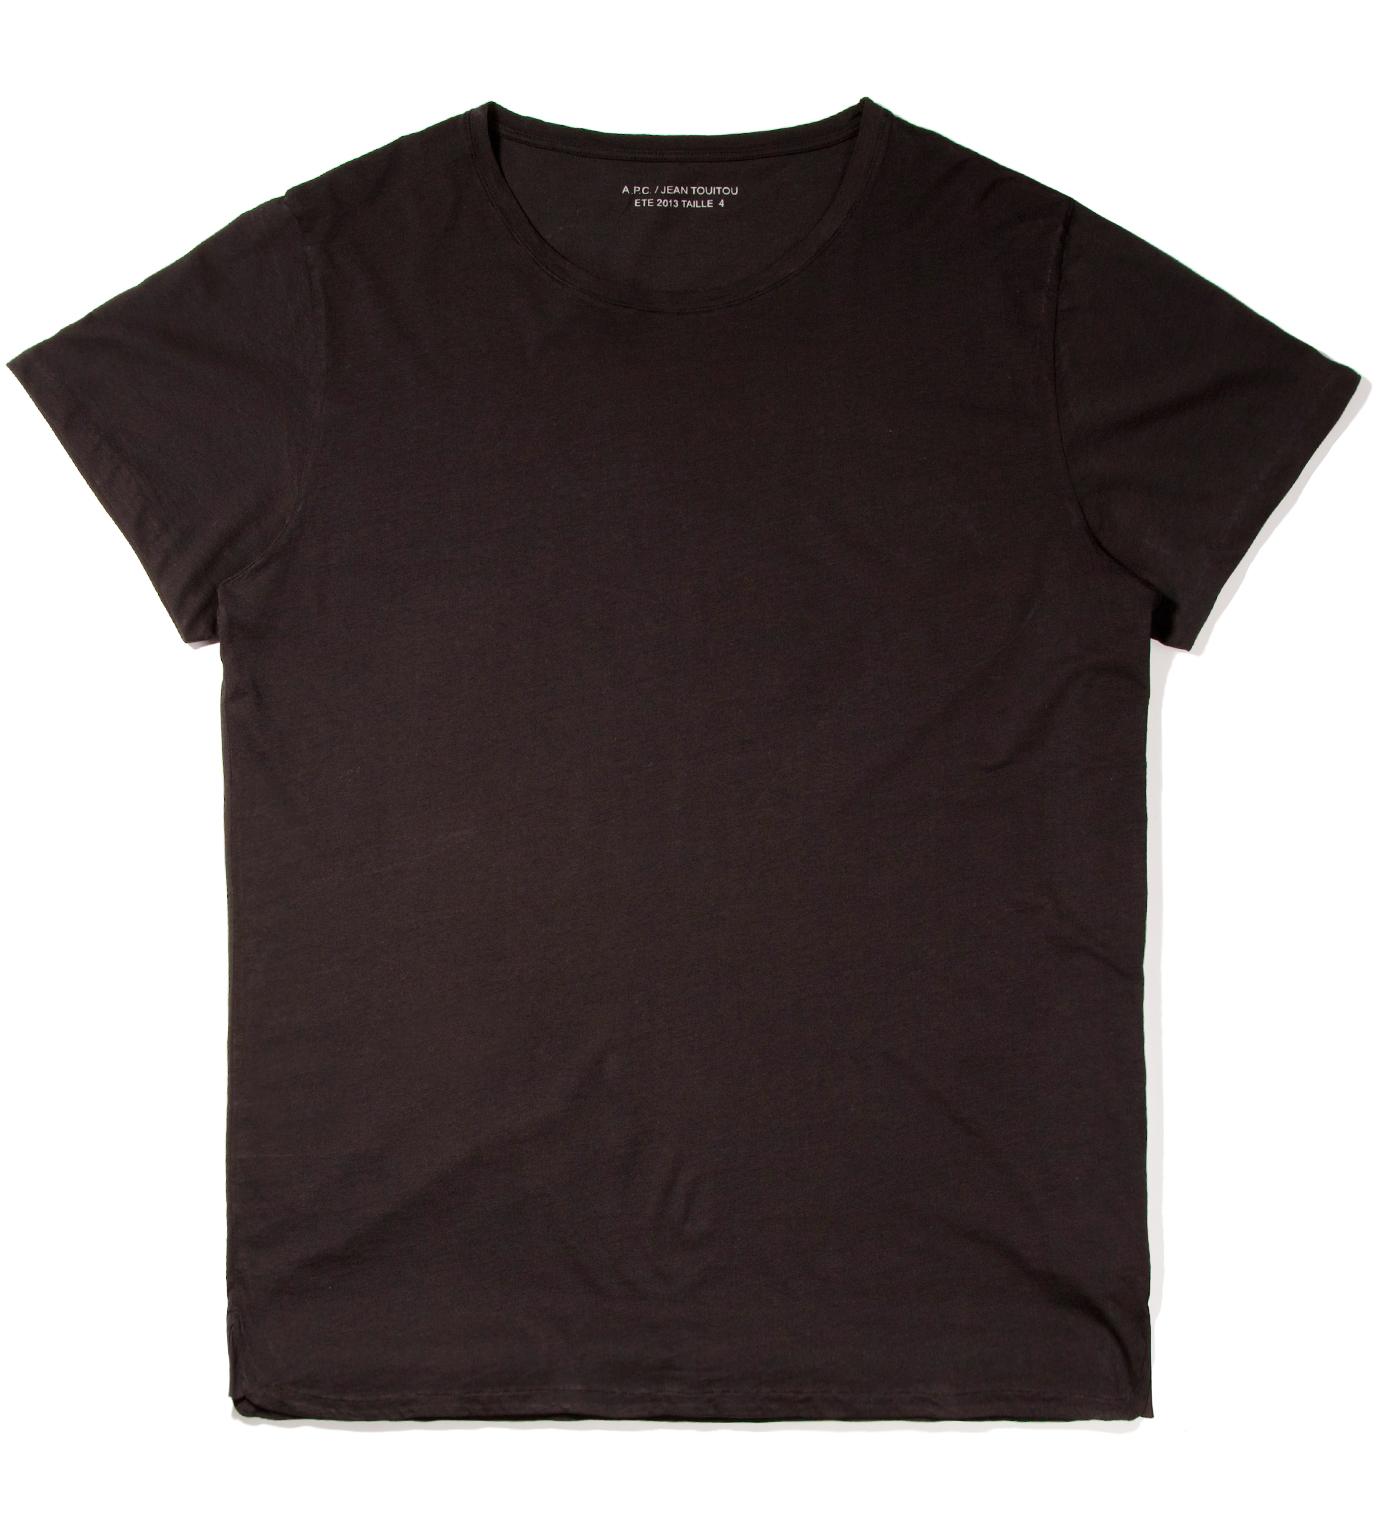 A.P.C. Black T-Shirt